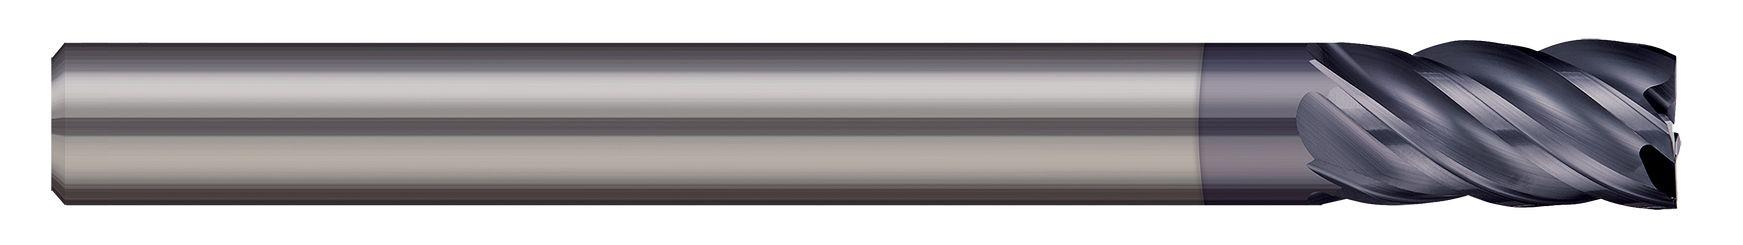 tool-details-VHM-312-5K